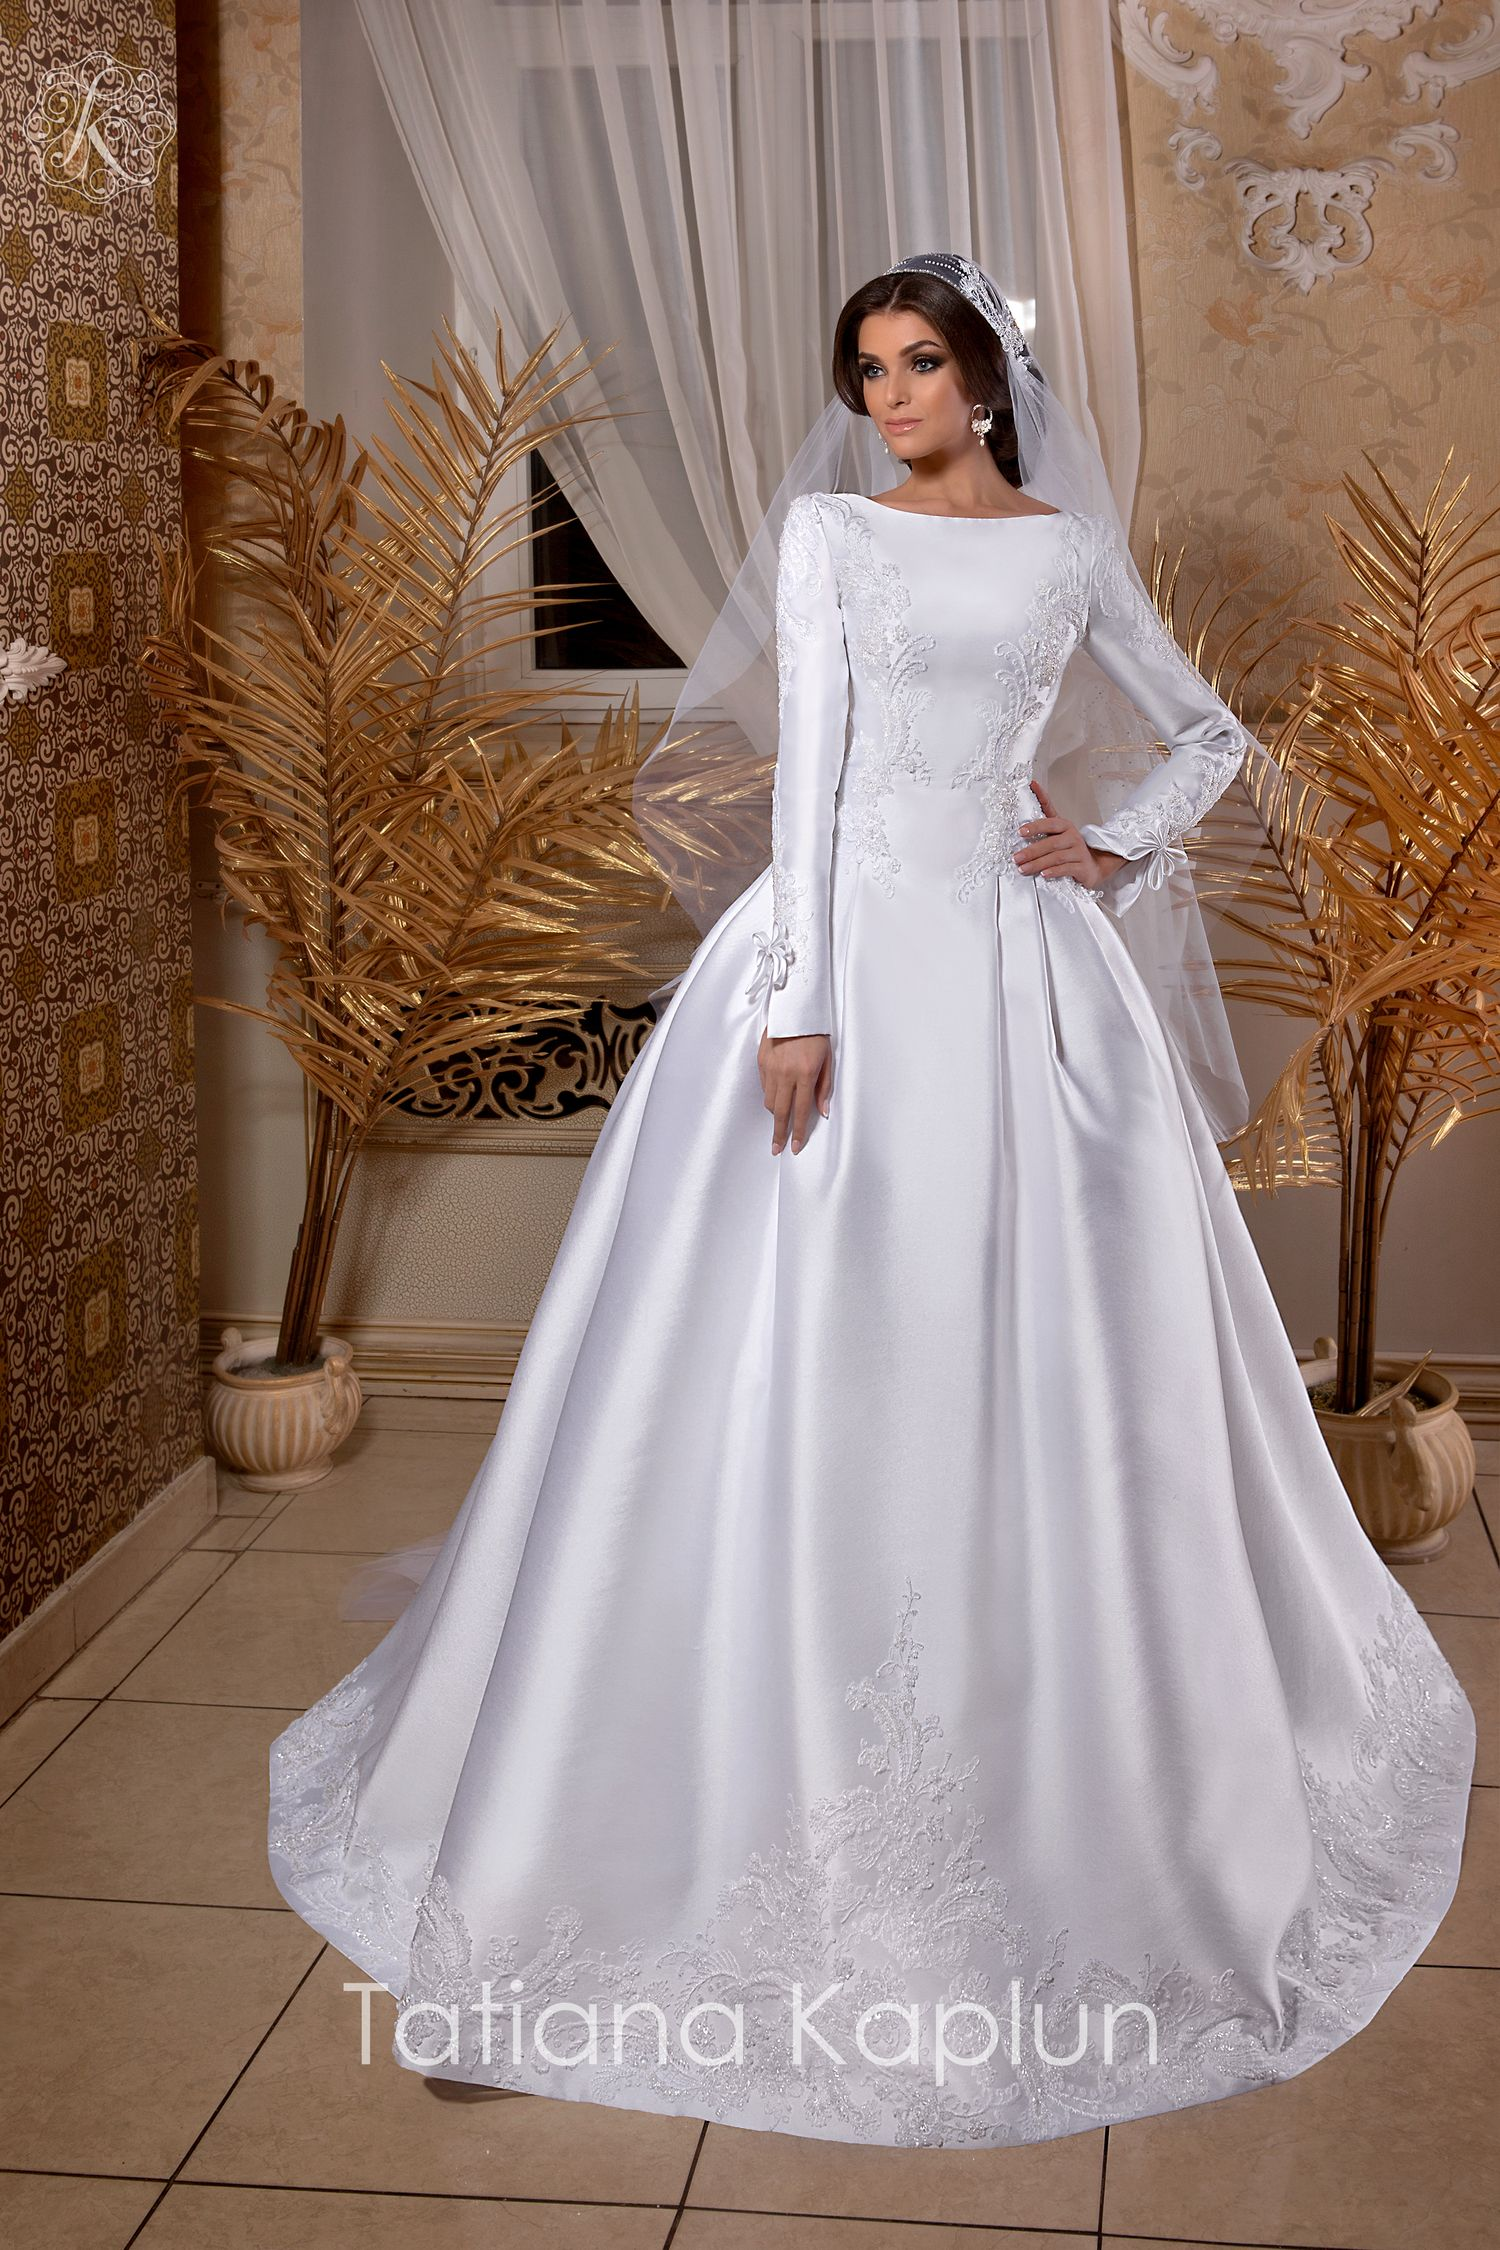 7a6e8e0f99d SEDA Dress By TATIANA KAPLUN   BEST WEDDING DRESSES in TAMPA BAY in ...